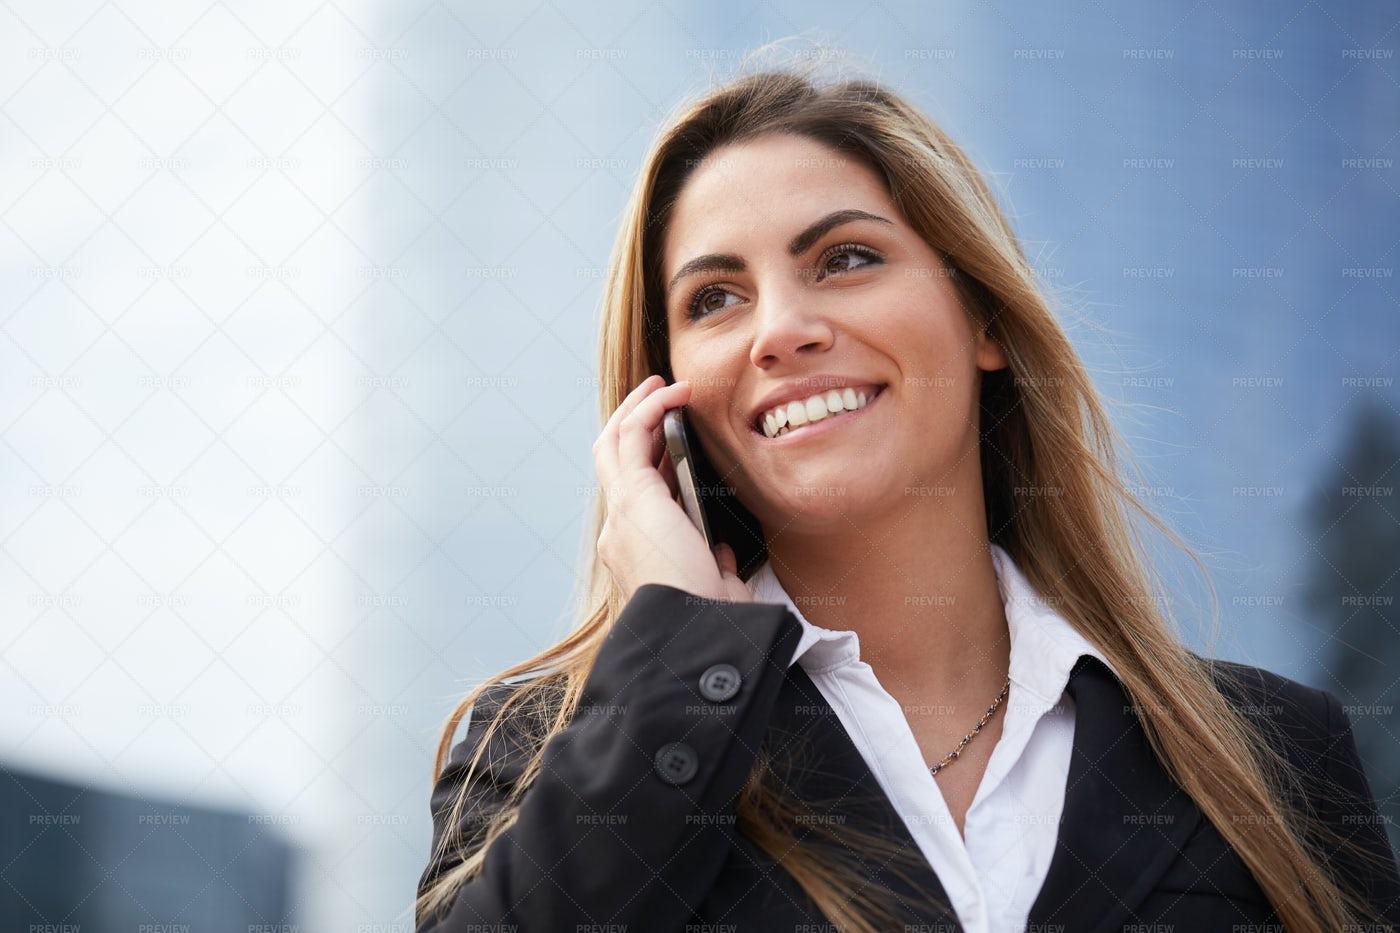 Businesswoman On Phone Call: Stock Photos